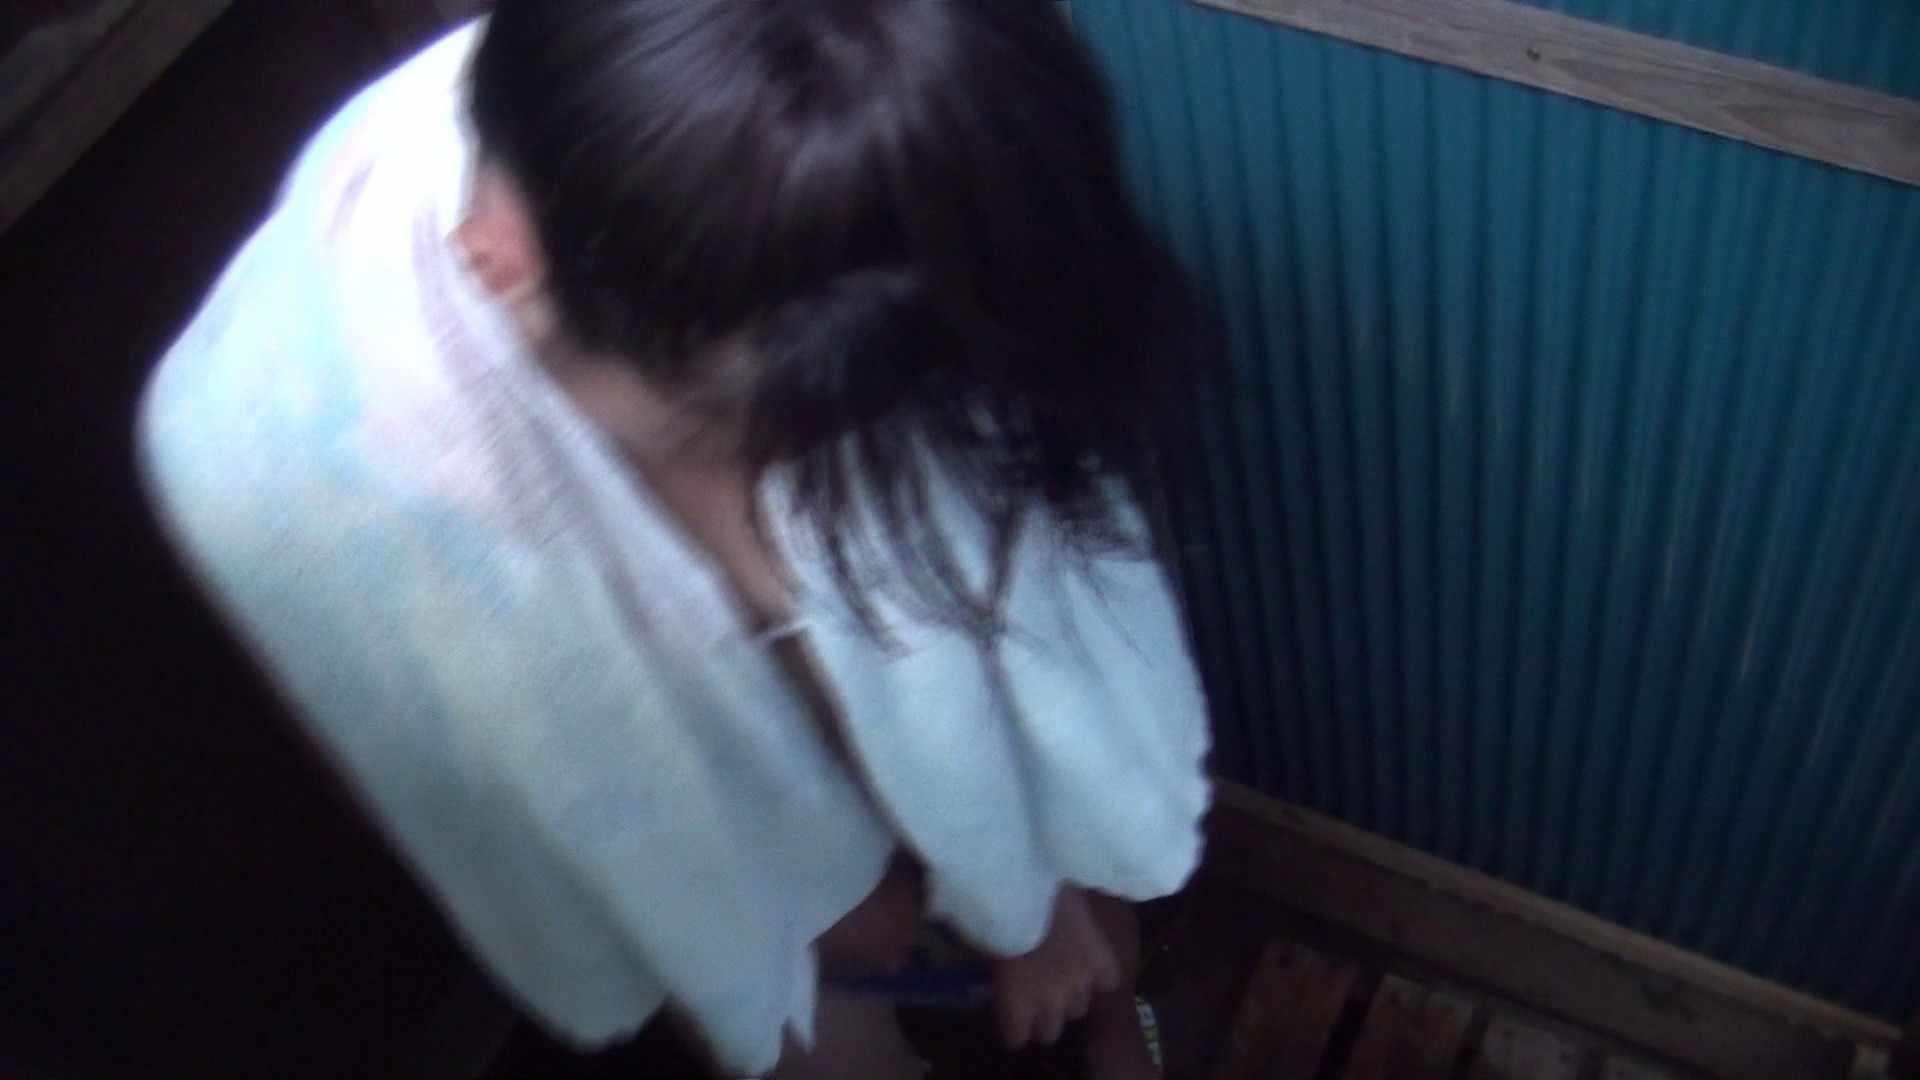 Vol.17 ガーリーなビキニと下着に興奮です! 高画質 | 桃色シャワー  79pic 53